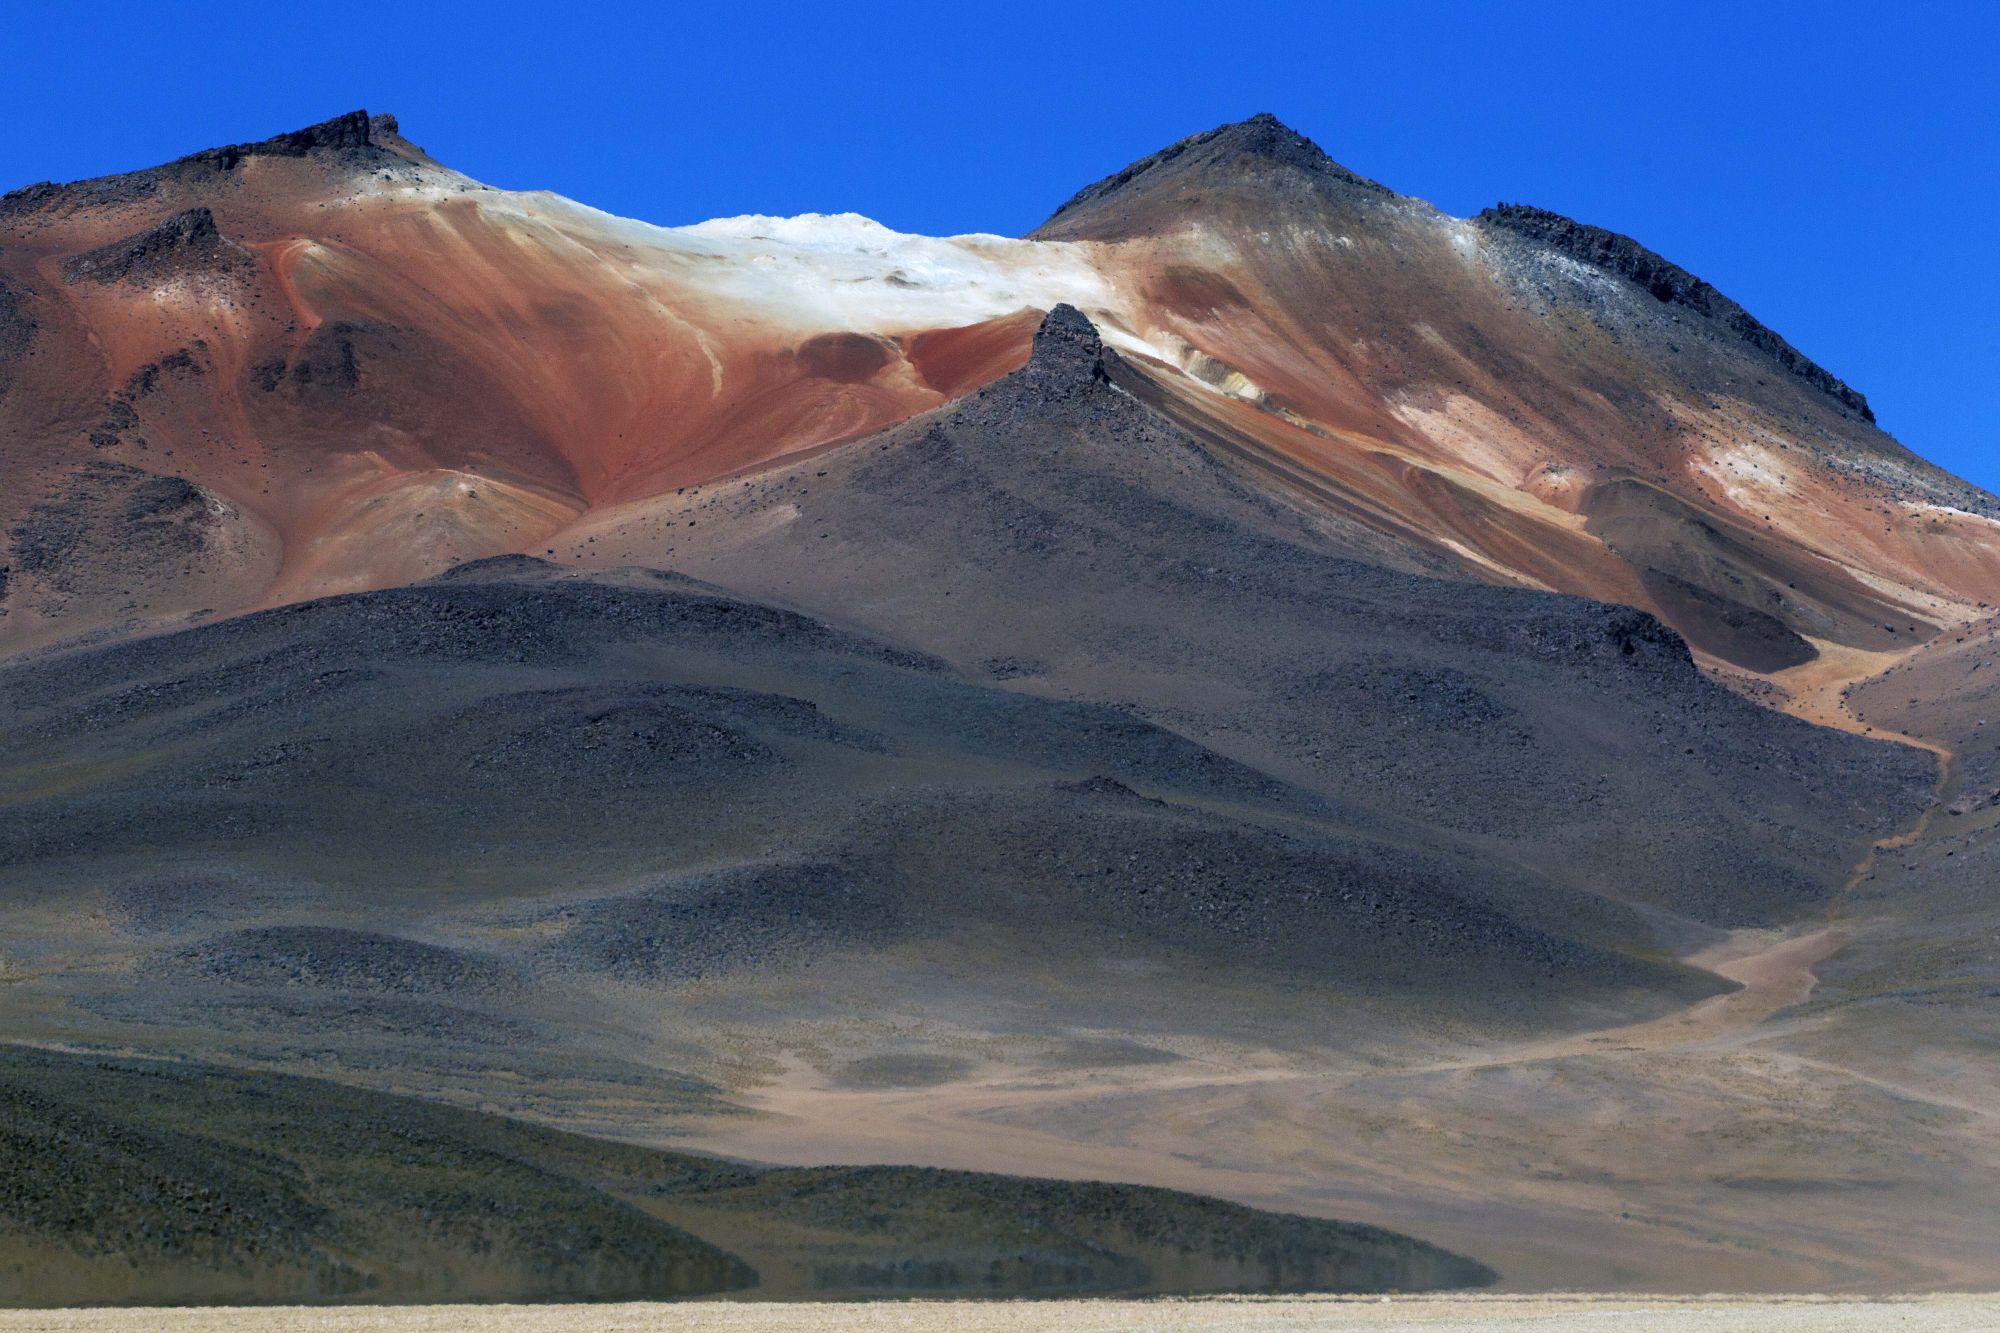 10 Reasons To Visit Bolivia's Stunning Salt Flats